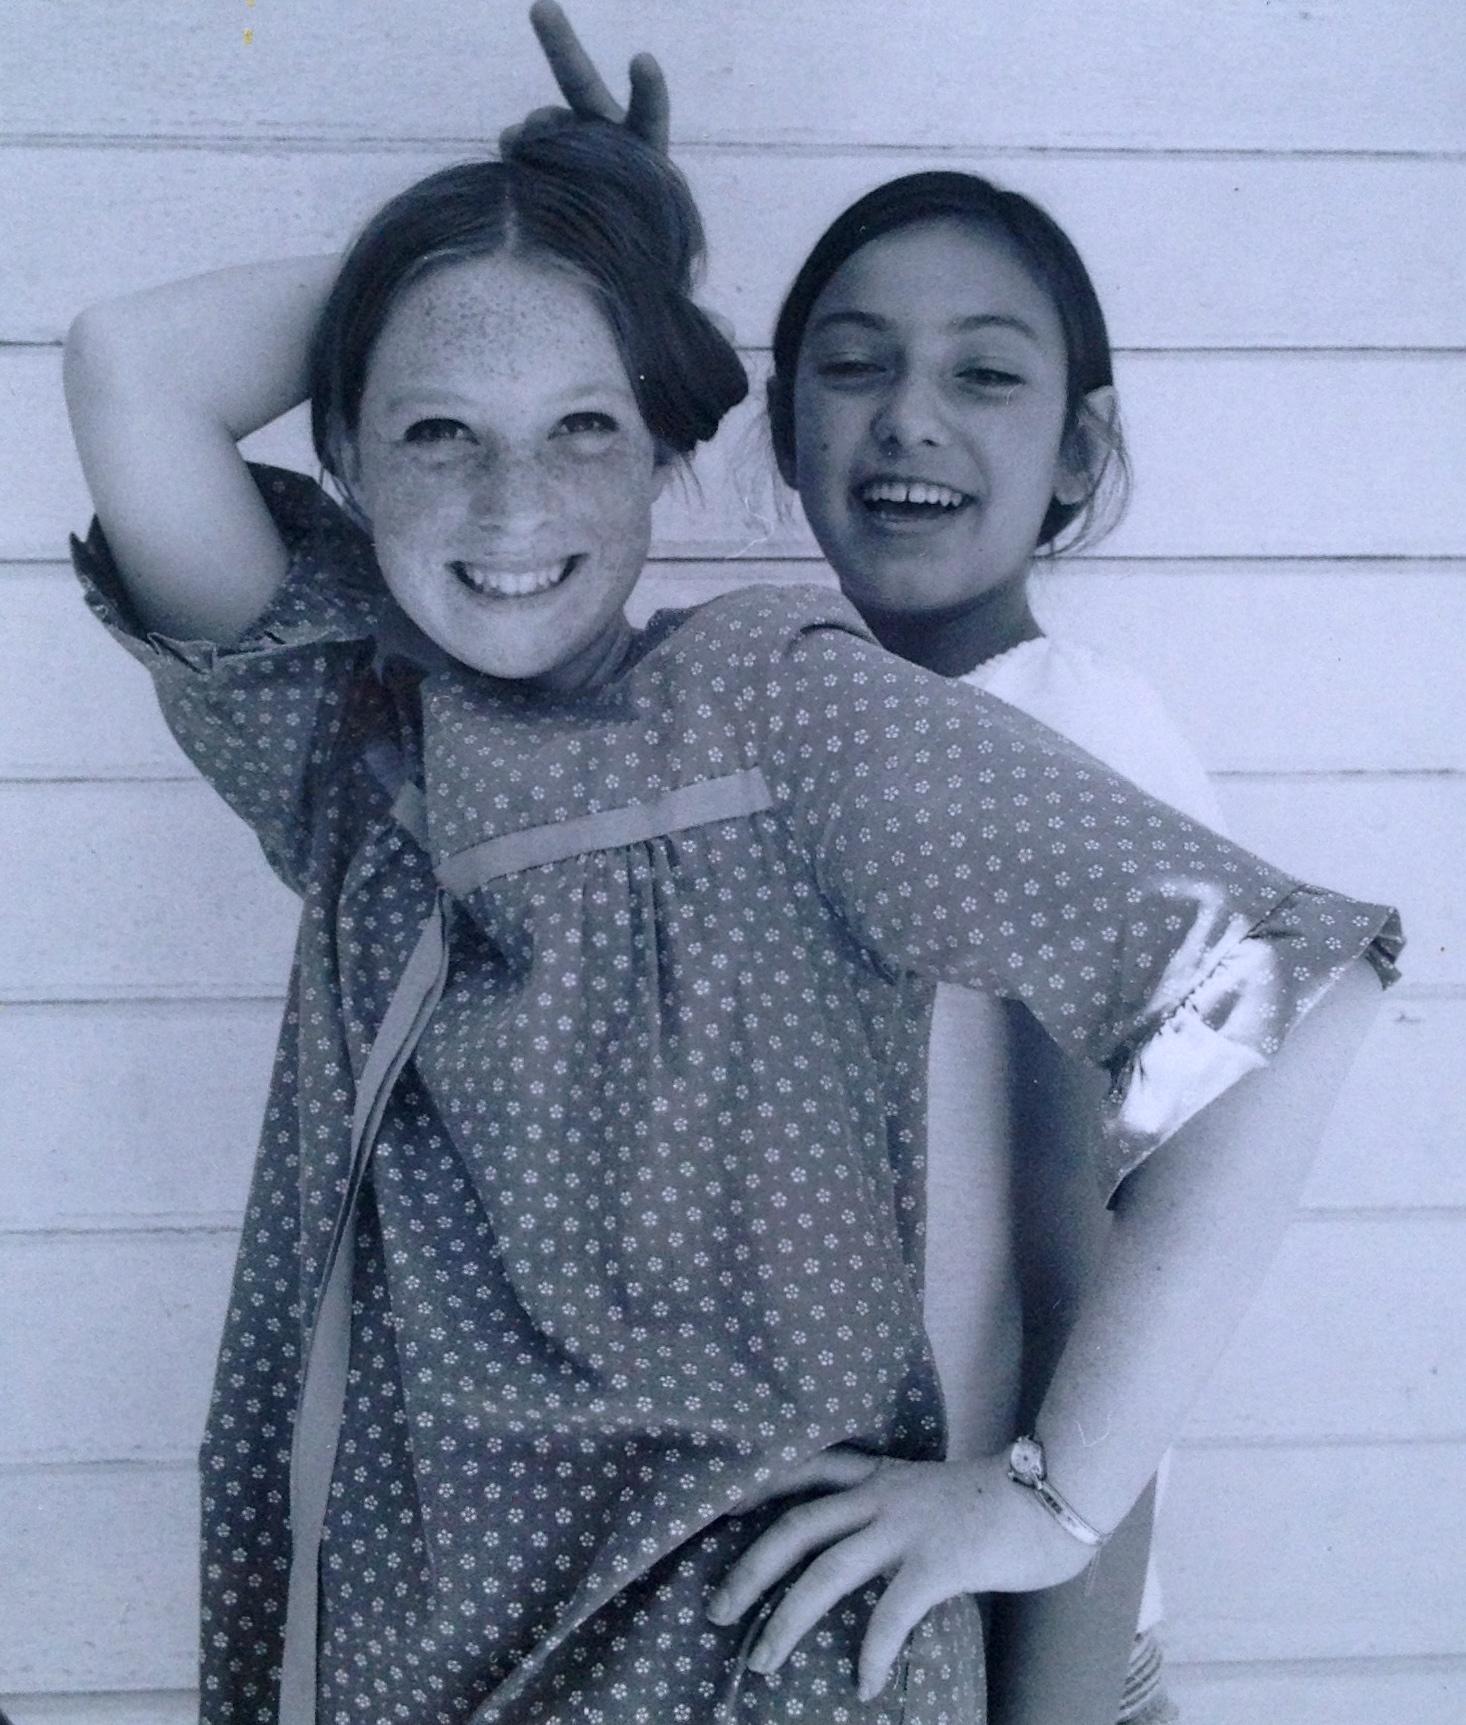 Judith O'Donnell & her best friend, Janette. 1969. Manhattan Beach, California.